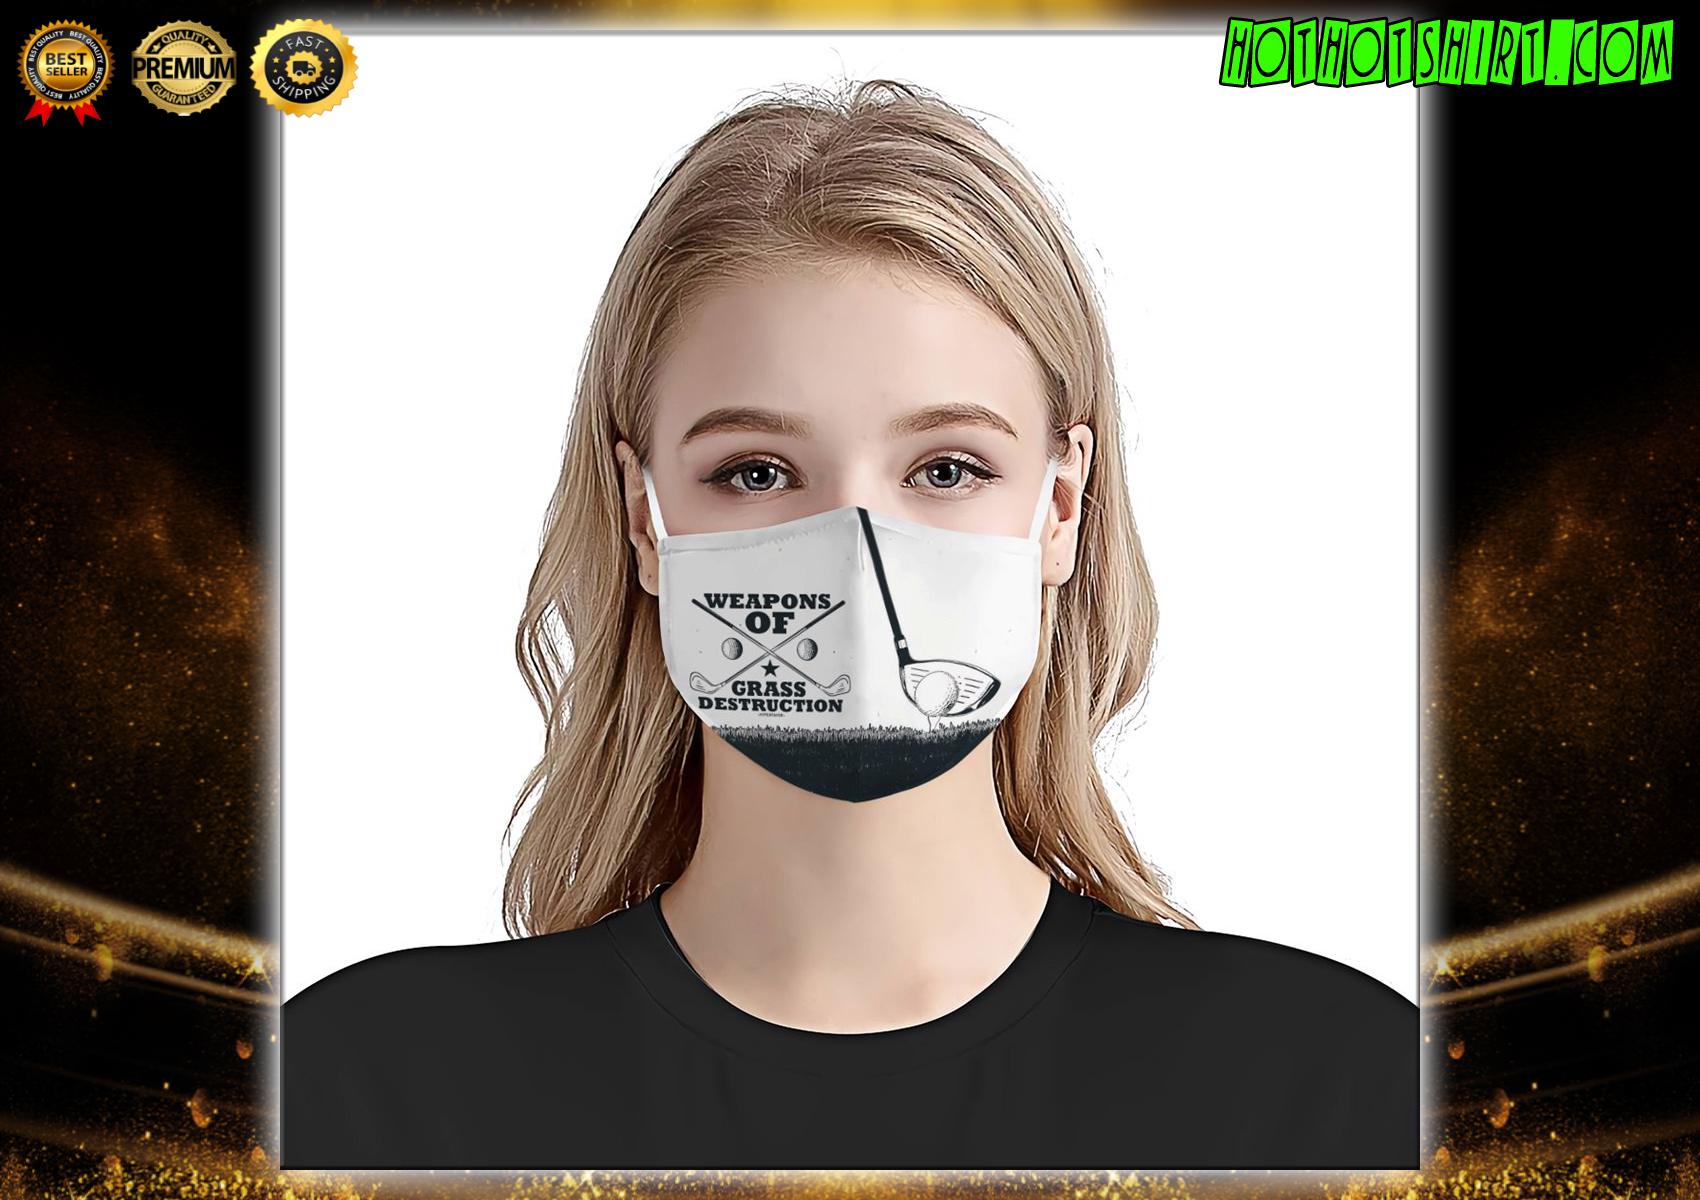 Golf weapons of grass destruction face mask - Hothot 270321